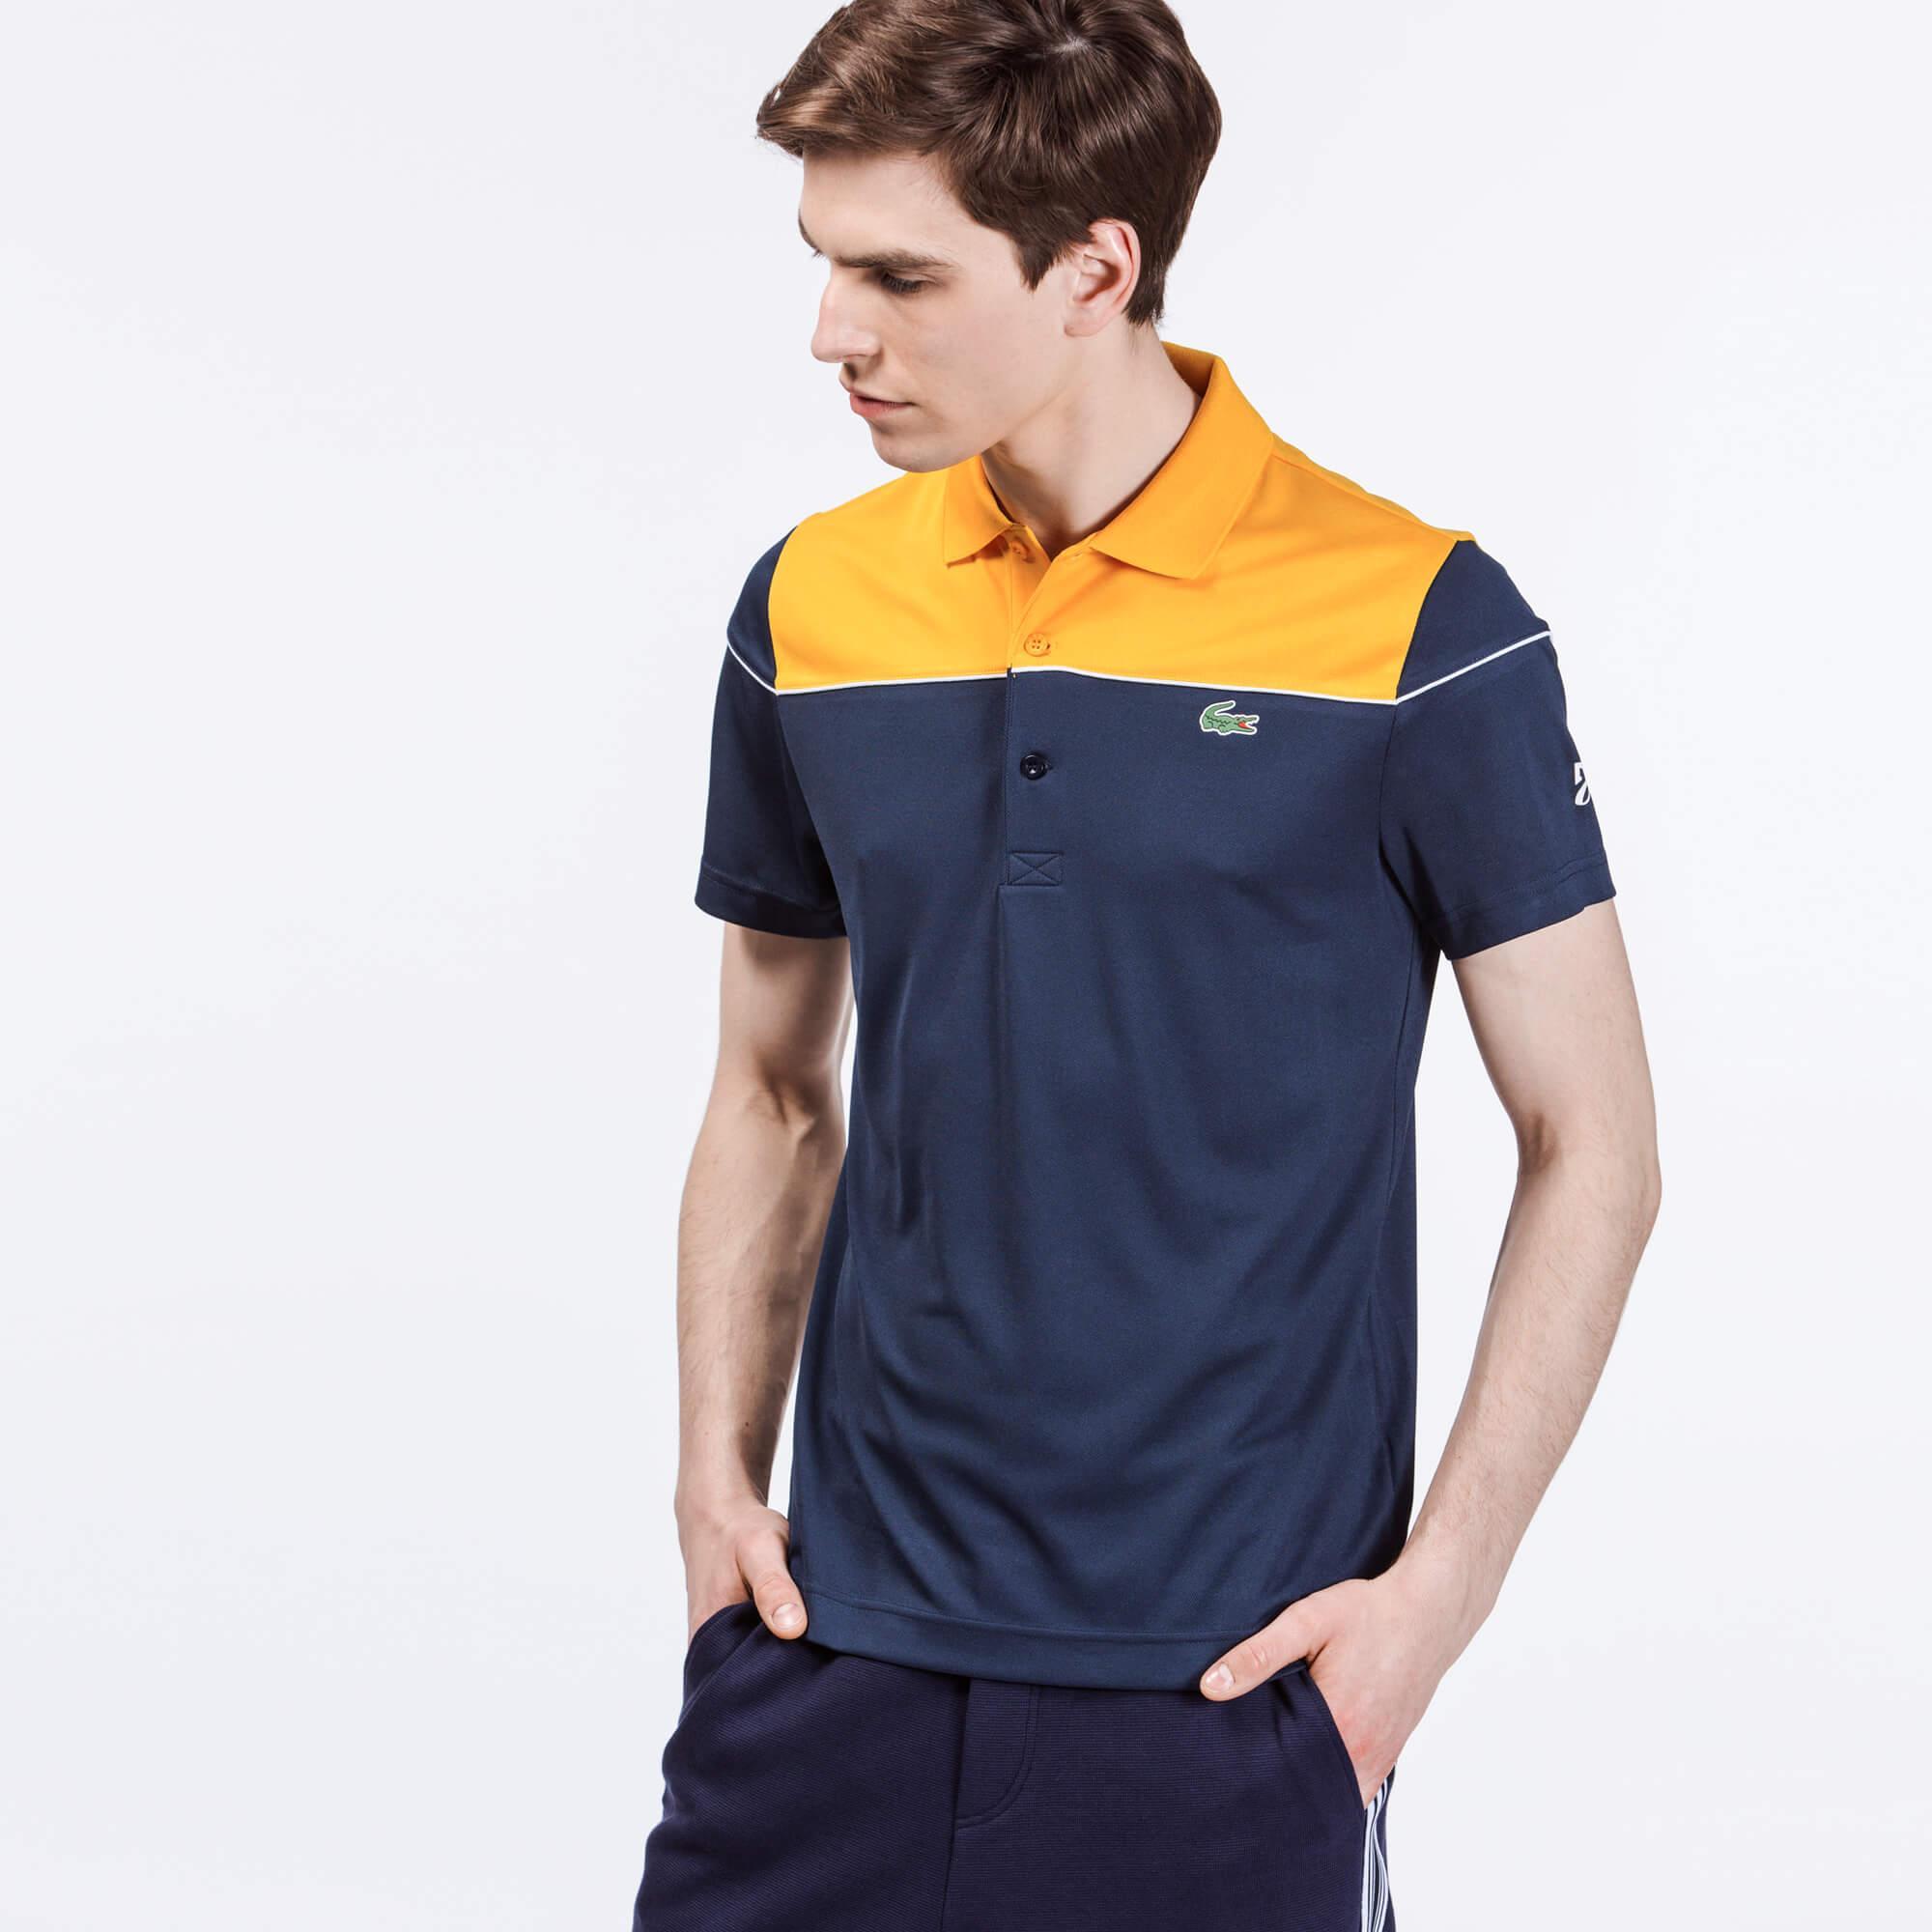 Lacoste Erkek Lacivert Novak Djokovic Polo